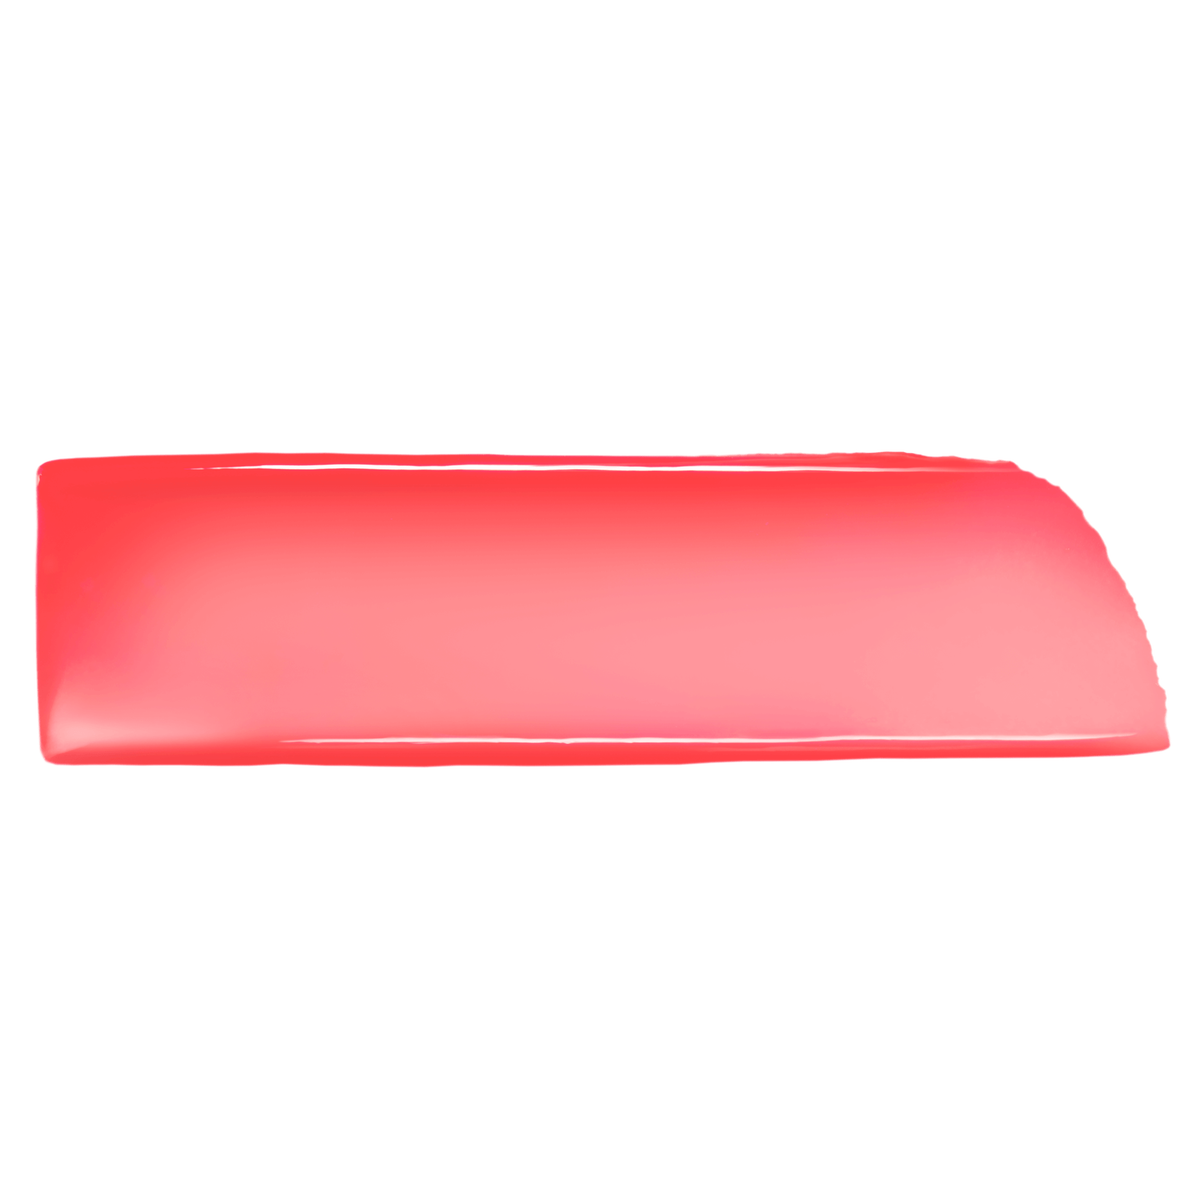 GIVENCHY Lipstick Rouge Interdit Vinyl Extreme Shine Colors 09 Coral